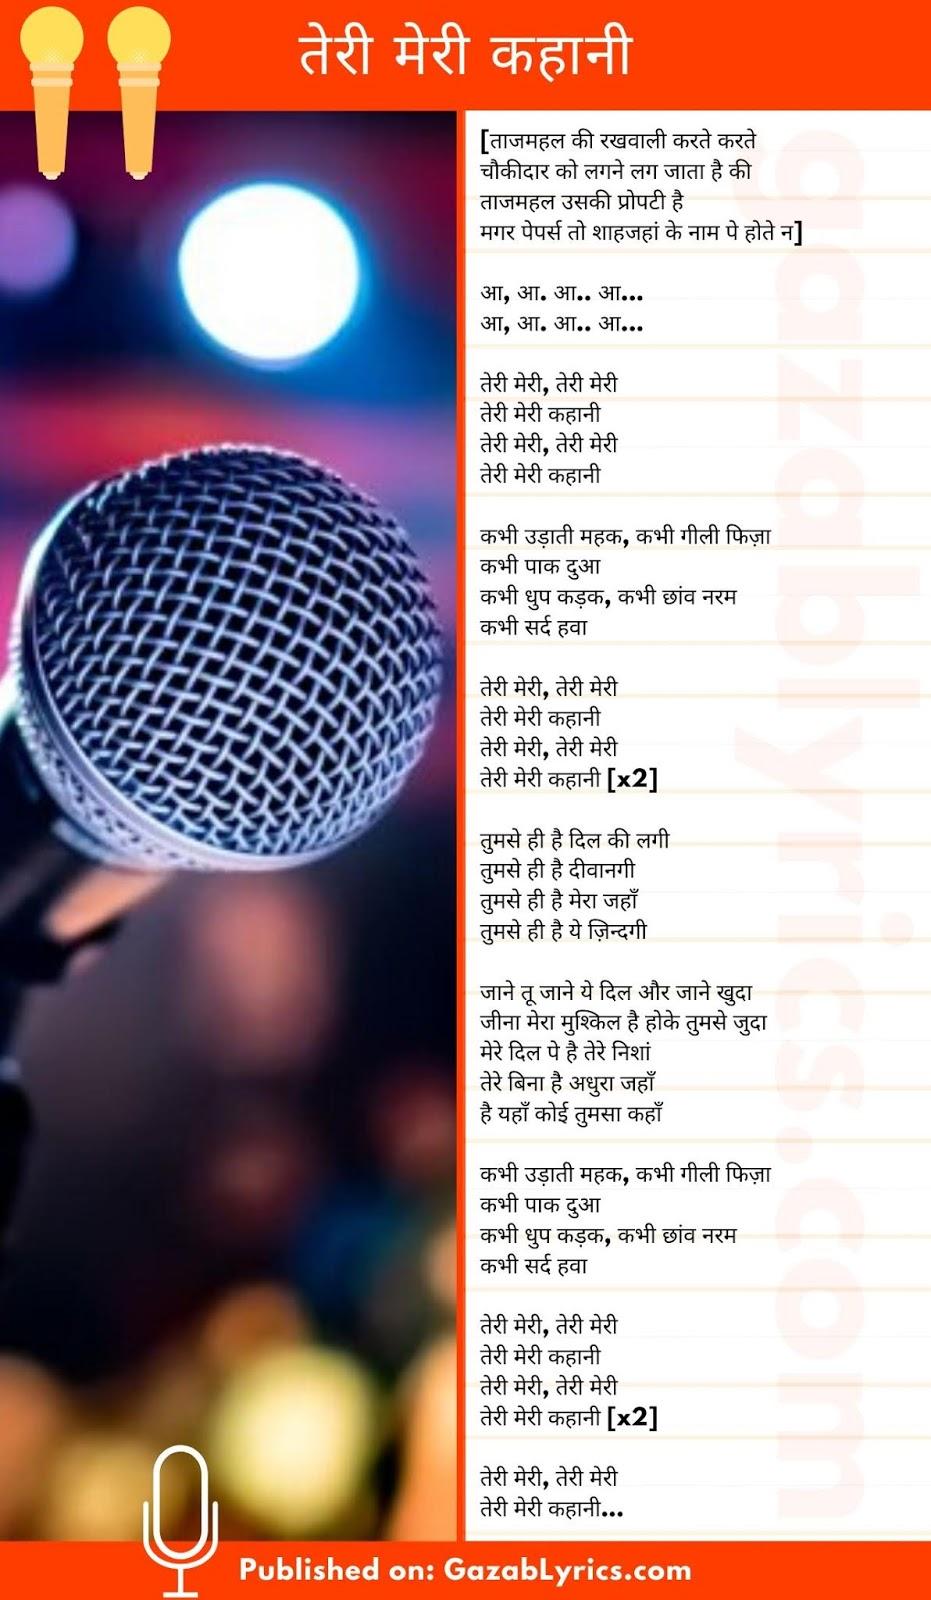 Teri Meri Kahani song lyrics image